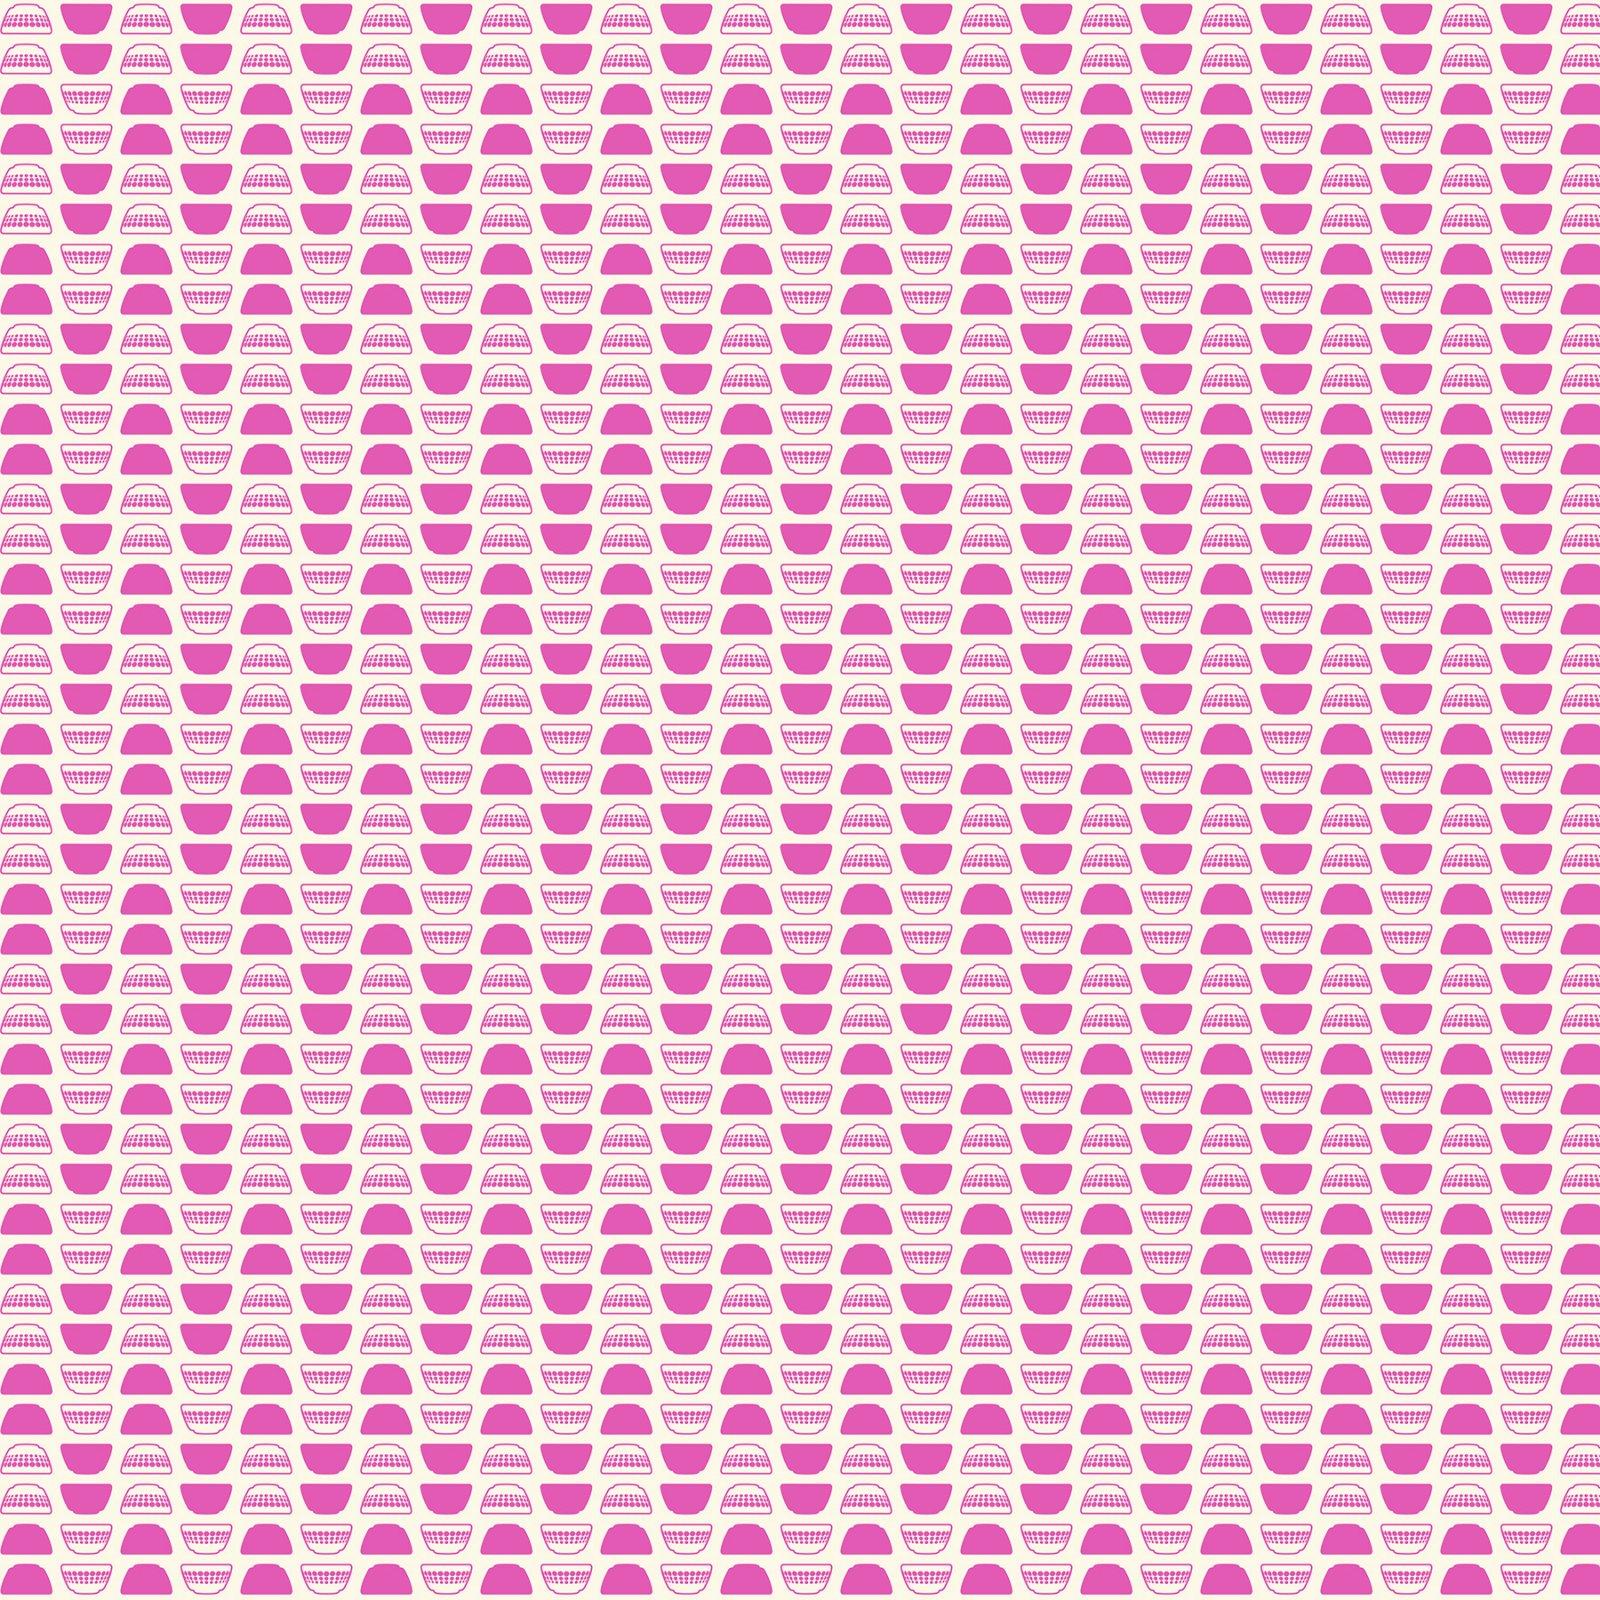 Butterscotch Bowls White/Pink